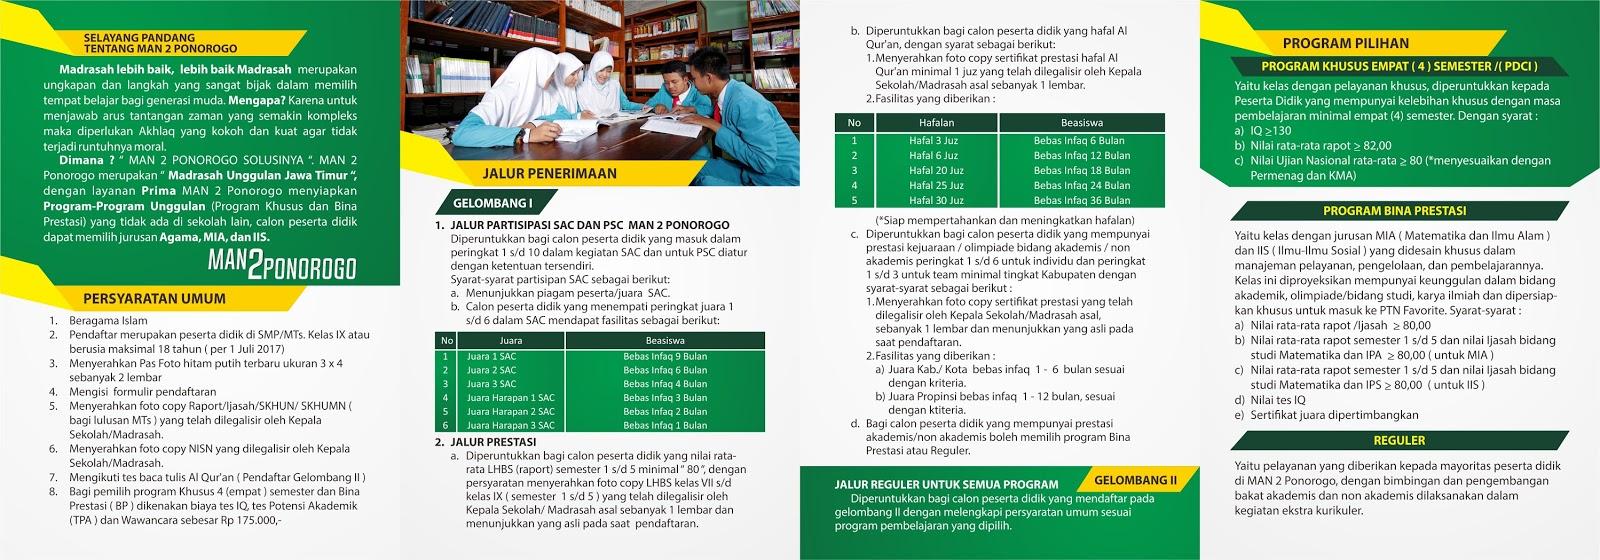 Informasi PPDB MAN 2 PONOROGO Tahun Ajaran 2017/2018